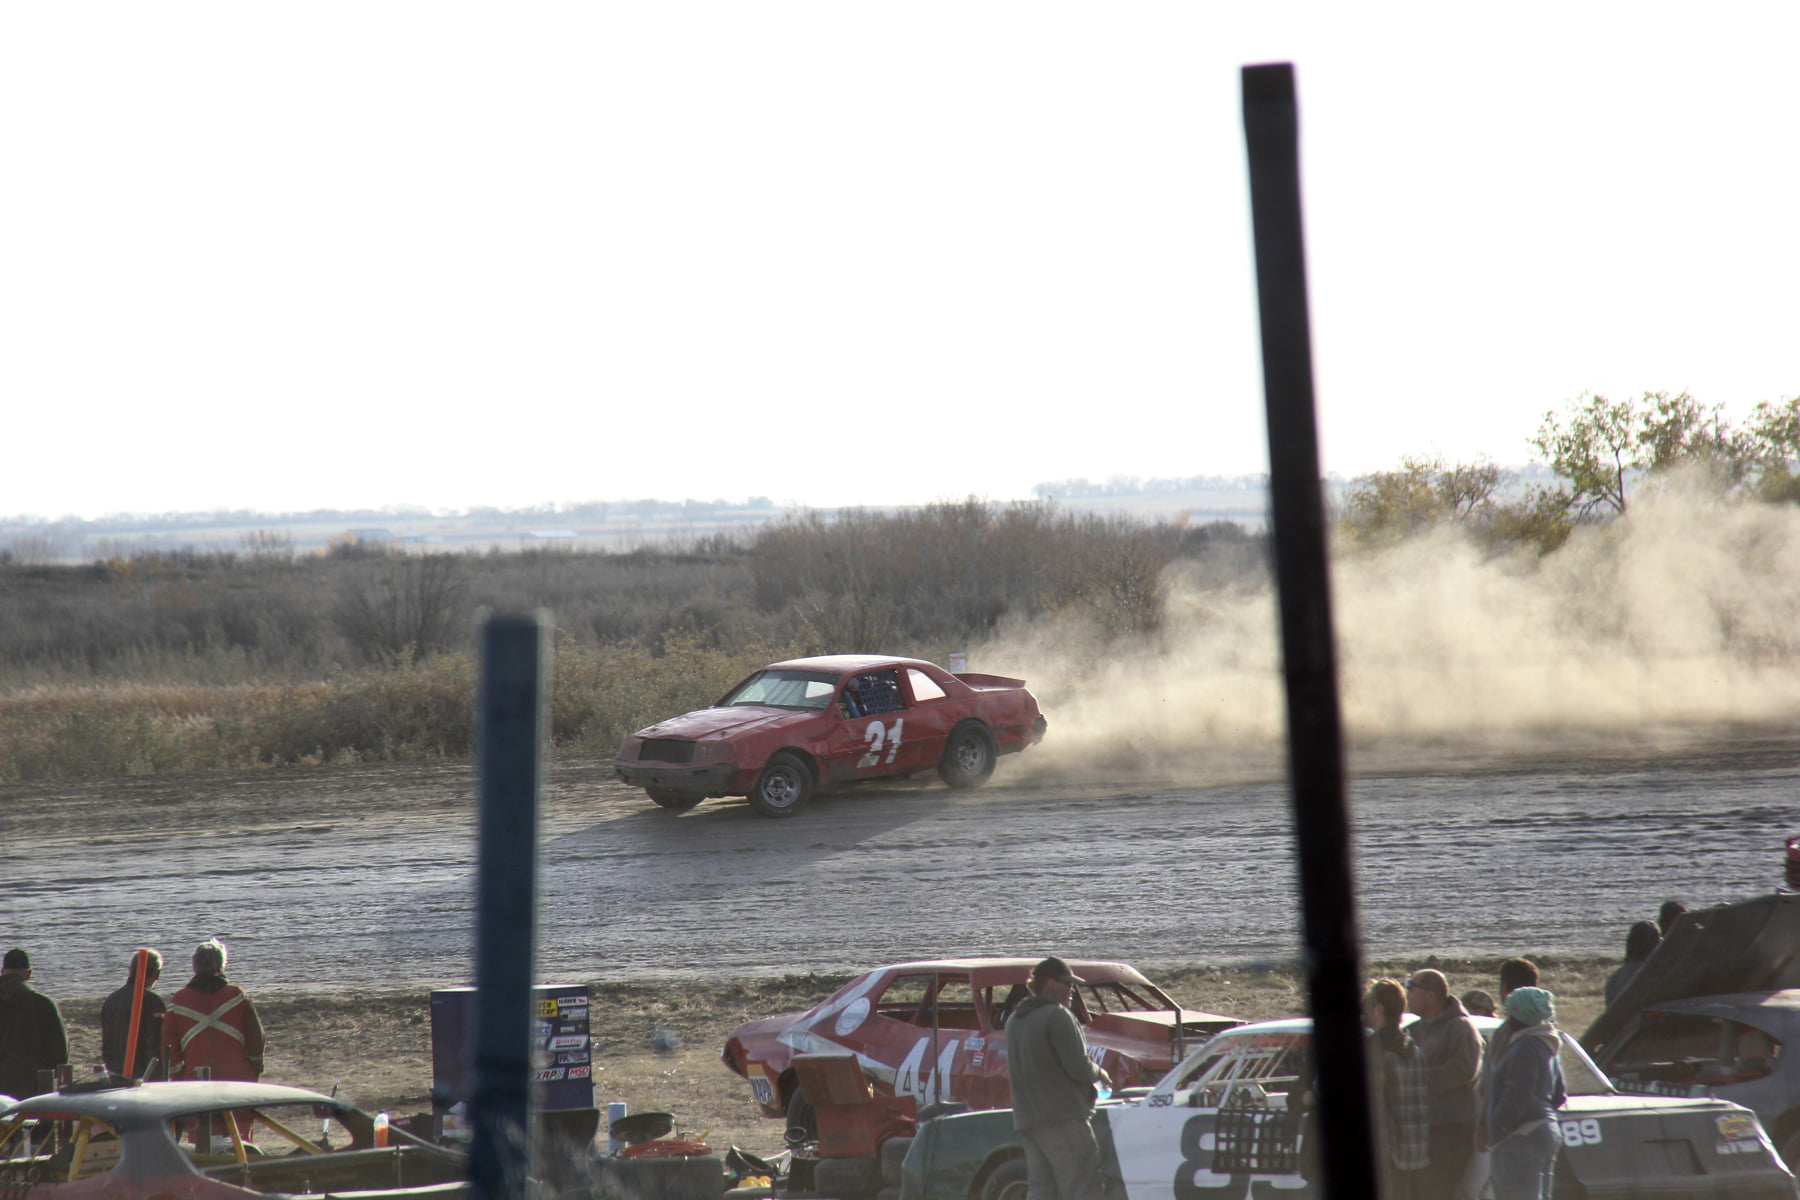 Outlook_Racing_Kemmer_Racing_Photography_23.jpg